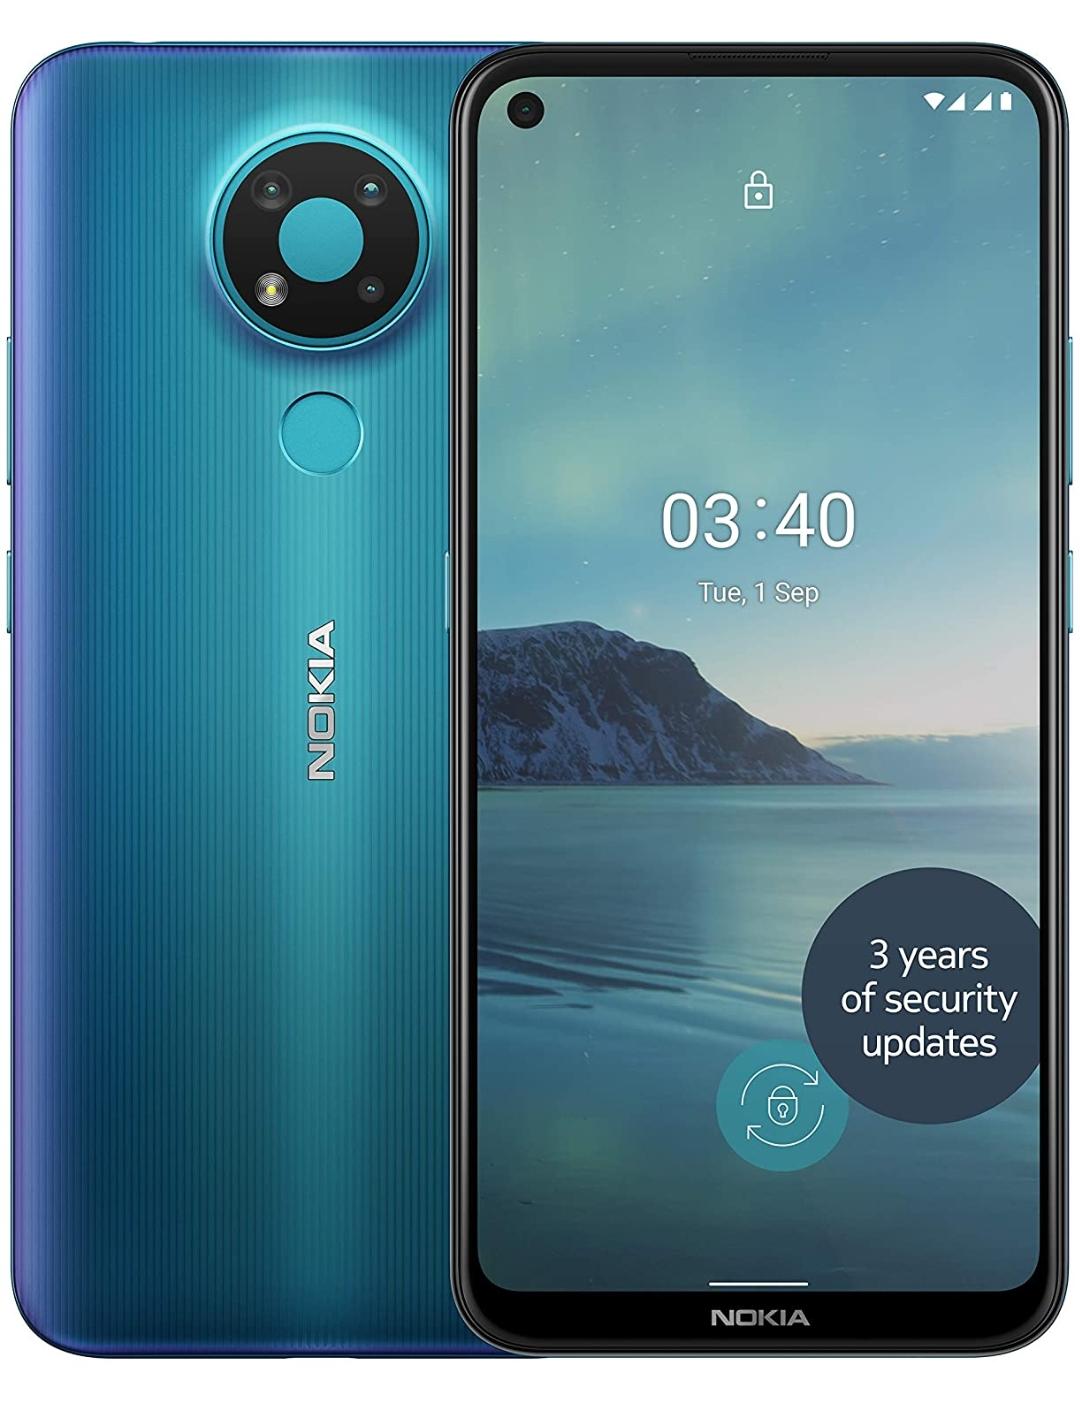 Nokia 3.4 6.39 Inch Android UK SIM-Free Smartphone - £79.99 @ Amazon Prime Exclusive